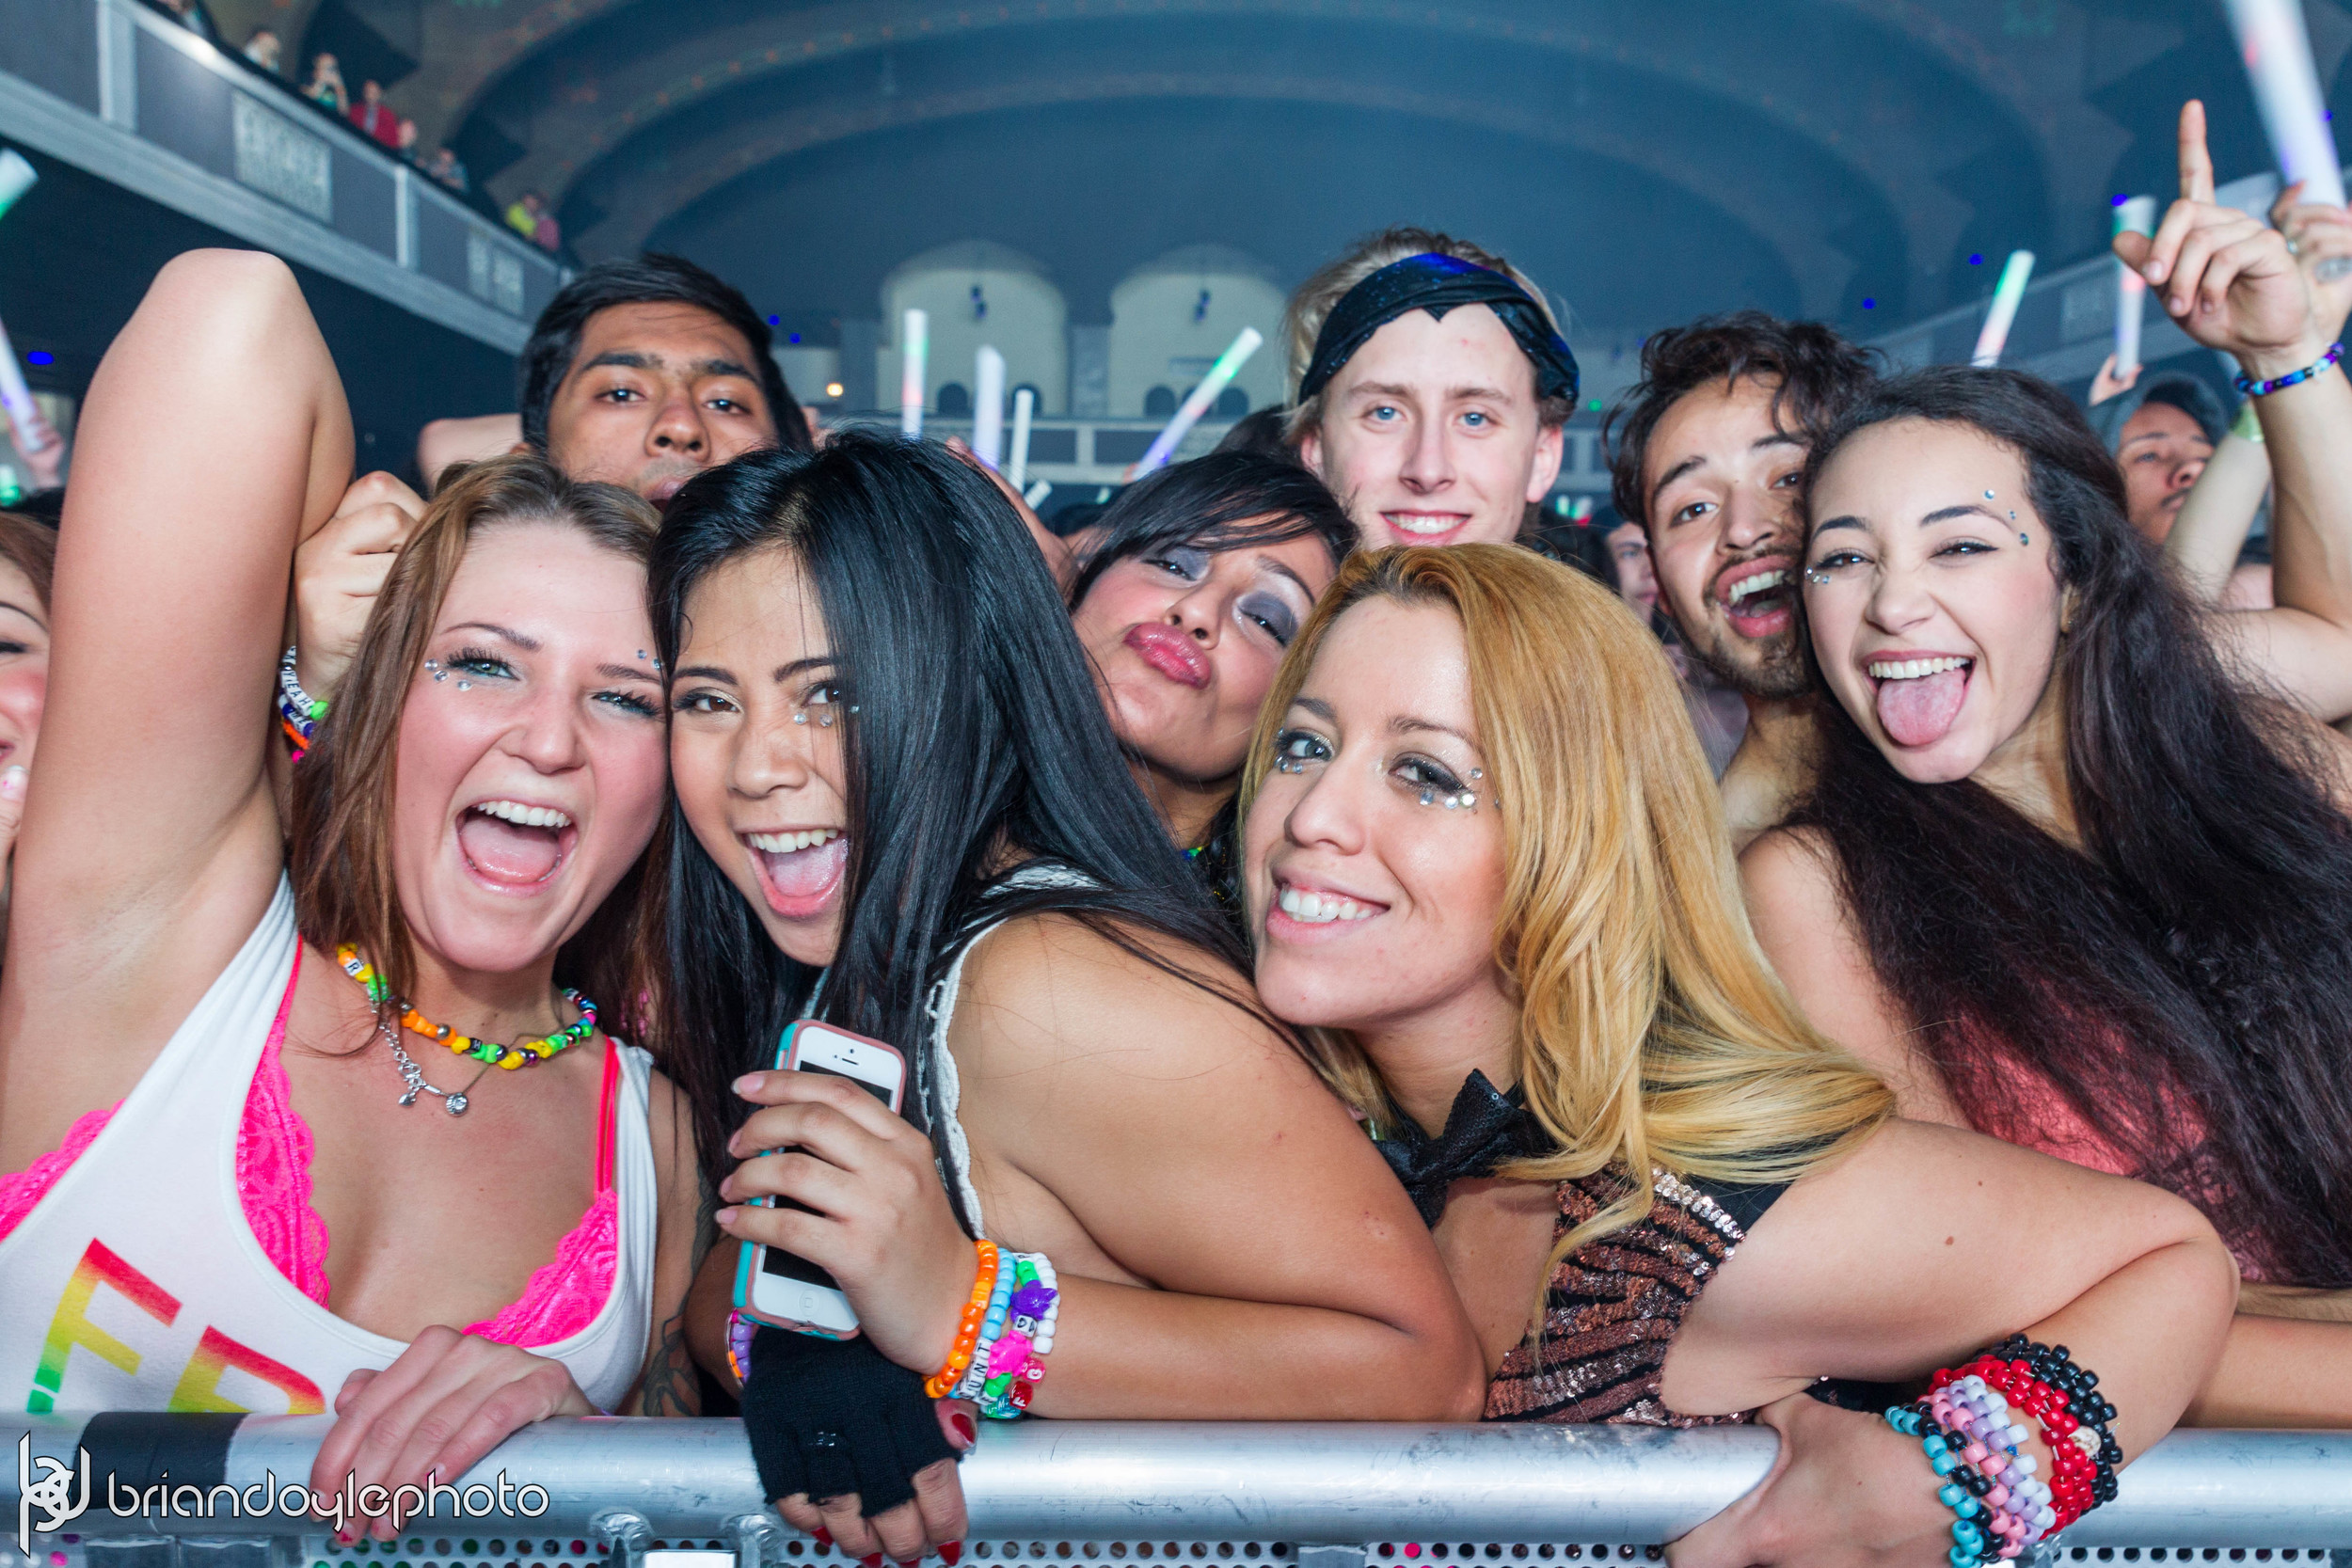 OMFG NYE 2015 LA - Eric Prydz, Henry Fong, Alex Metric, Botnek, Anna Lunoe, Wiwek 2014.12.31-7677.jpg